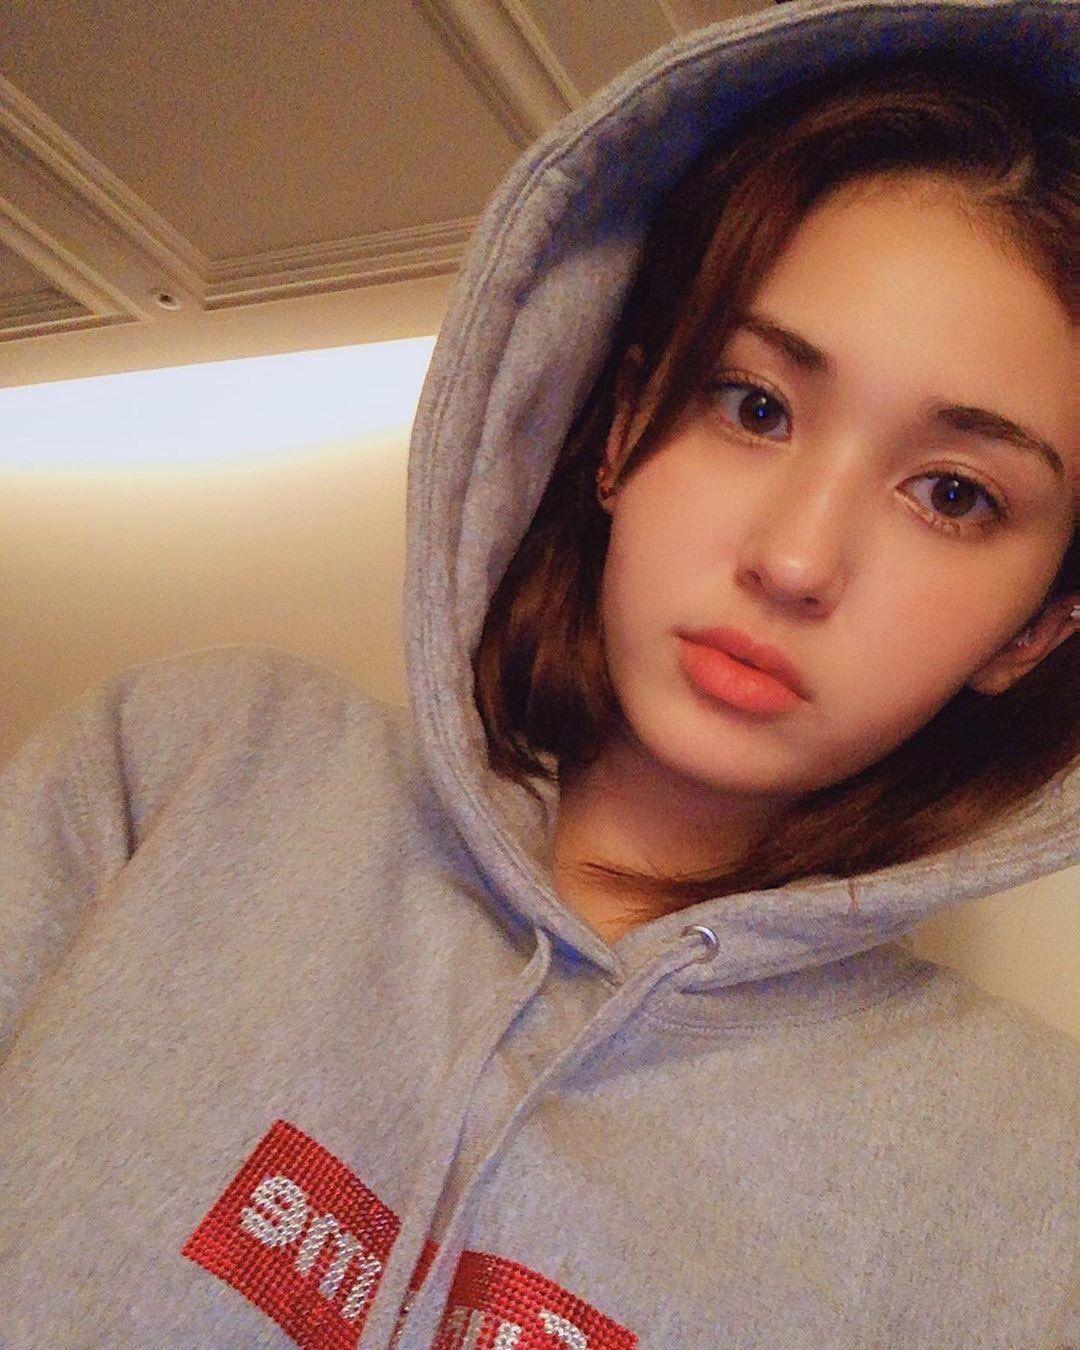 Jeonsomi Somi Ioi Blacklabel Jyp Cutie Love Kpop Korean Canadian Yg Nct Rain Gadis Korea Selebriti Selebritas